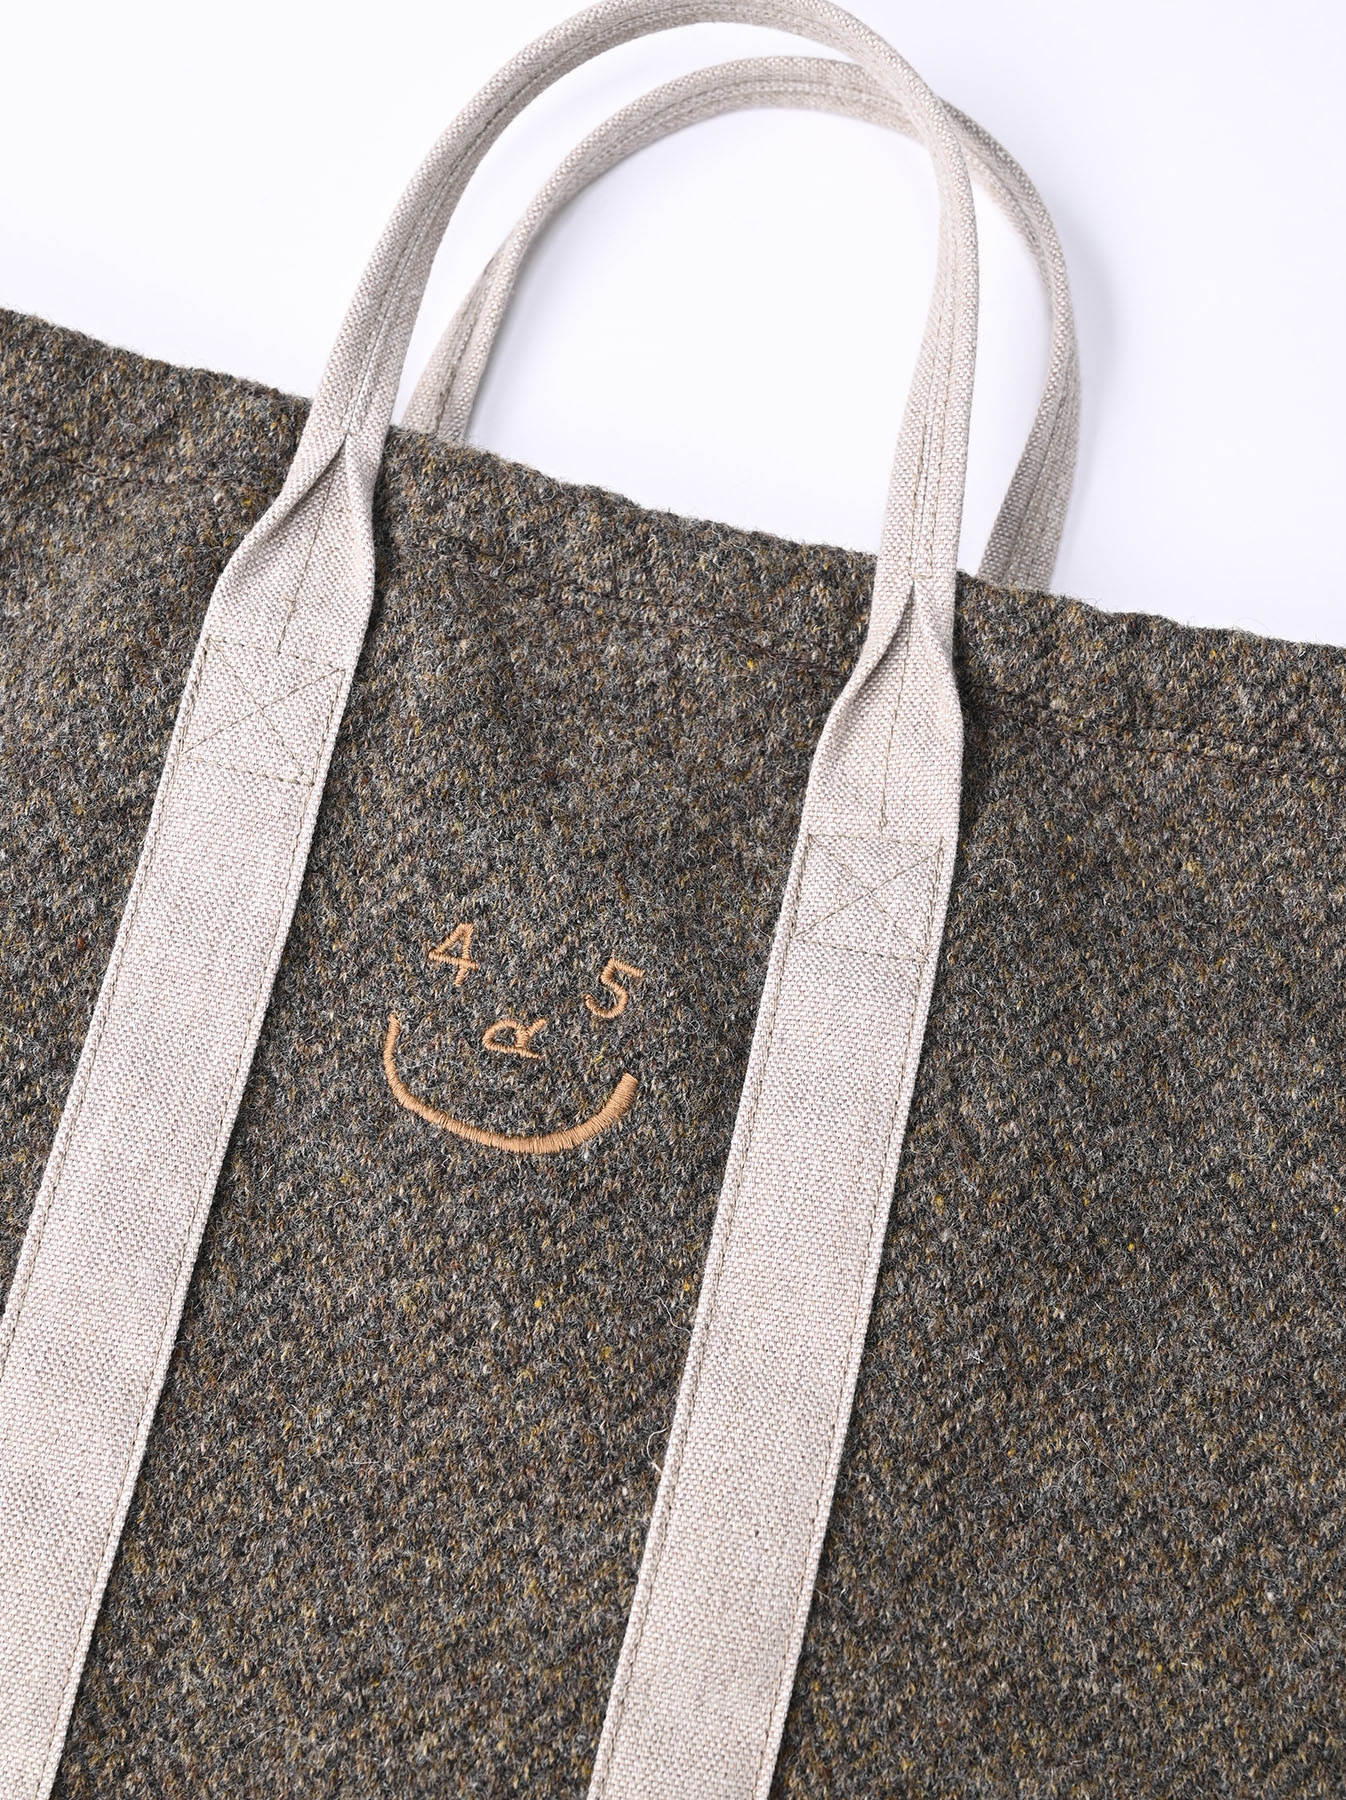 Tweed Knit and Nylon Tote Bag-6